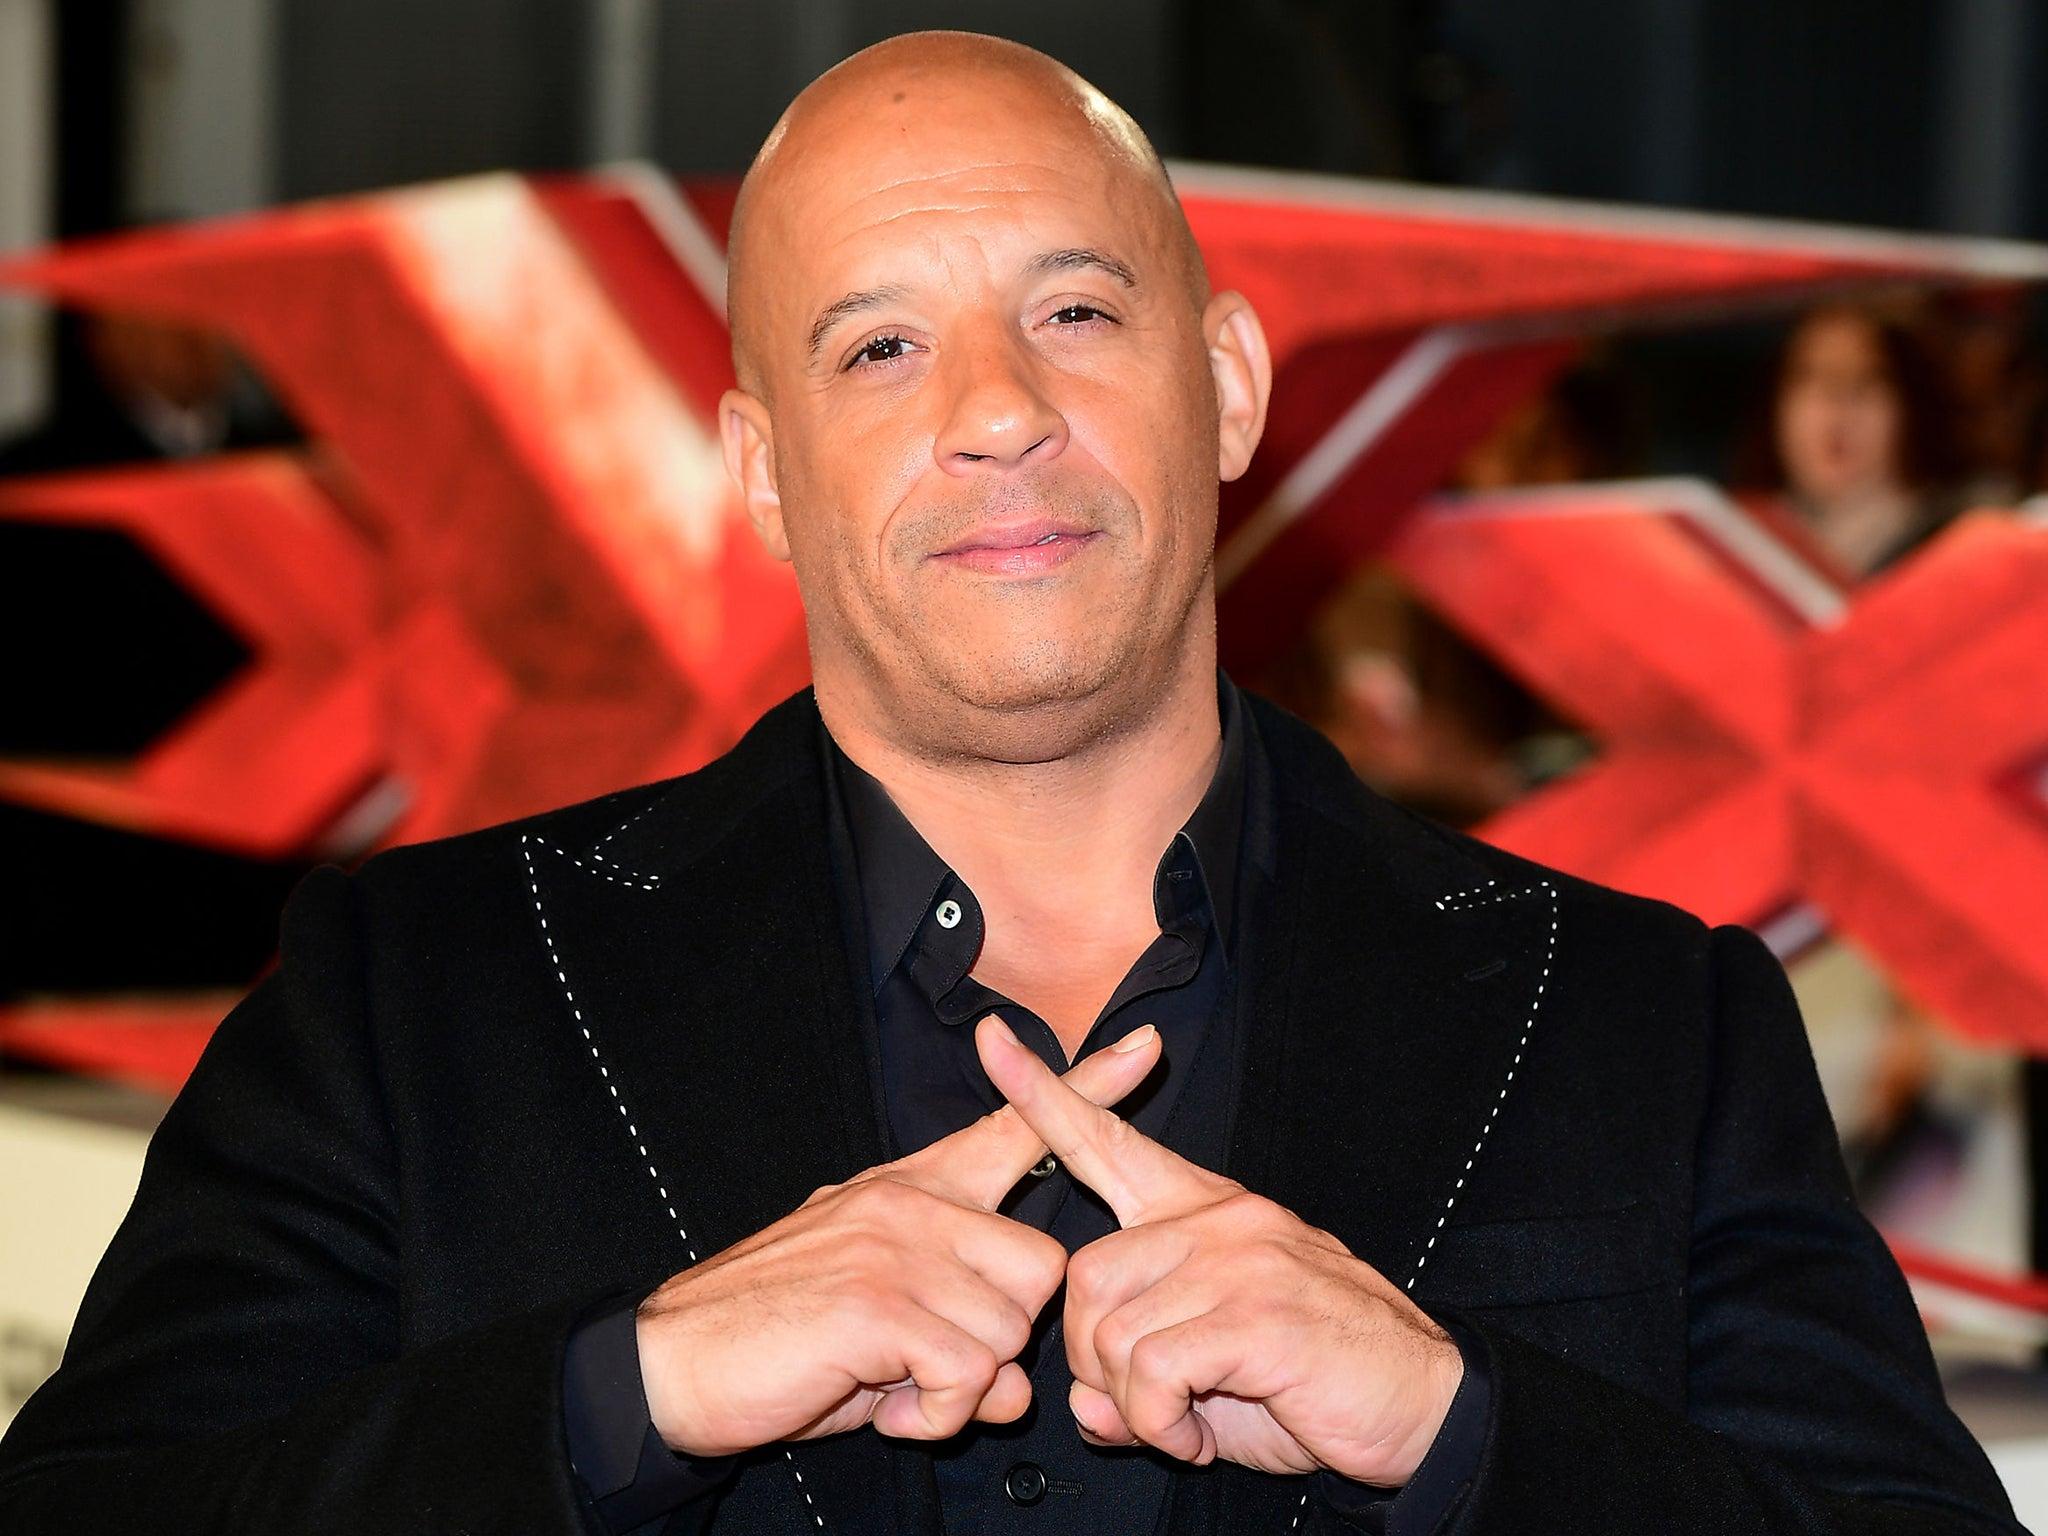 Vin Diesel nude (84 fotos), pictures Paparazzi, Instagram, lingerie 2020